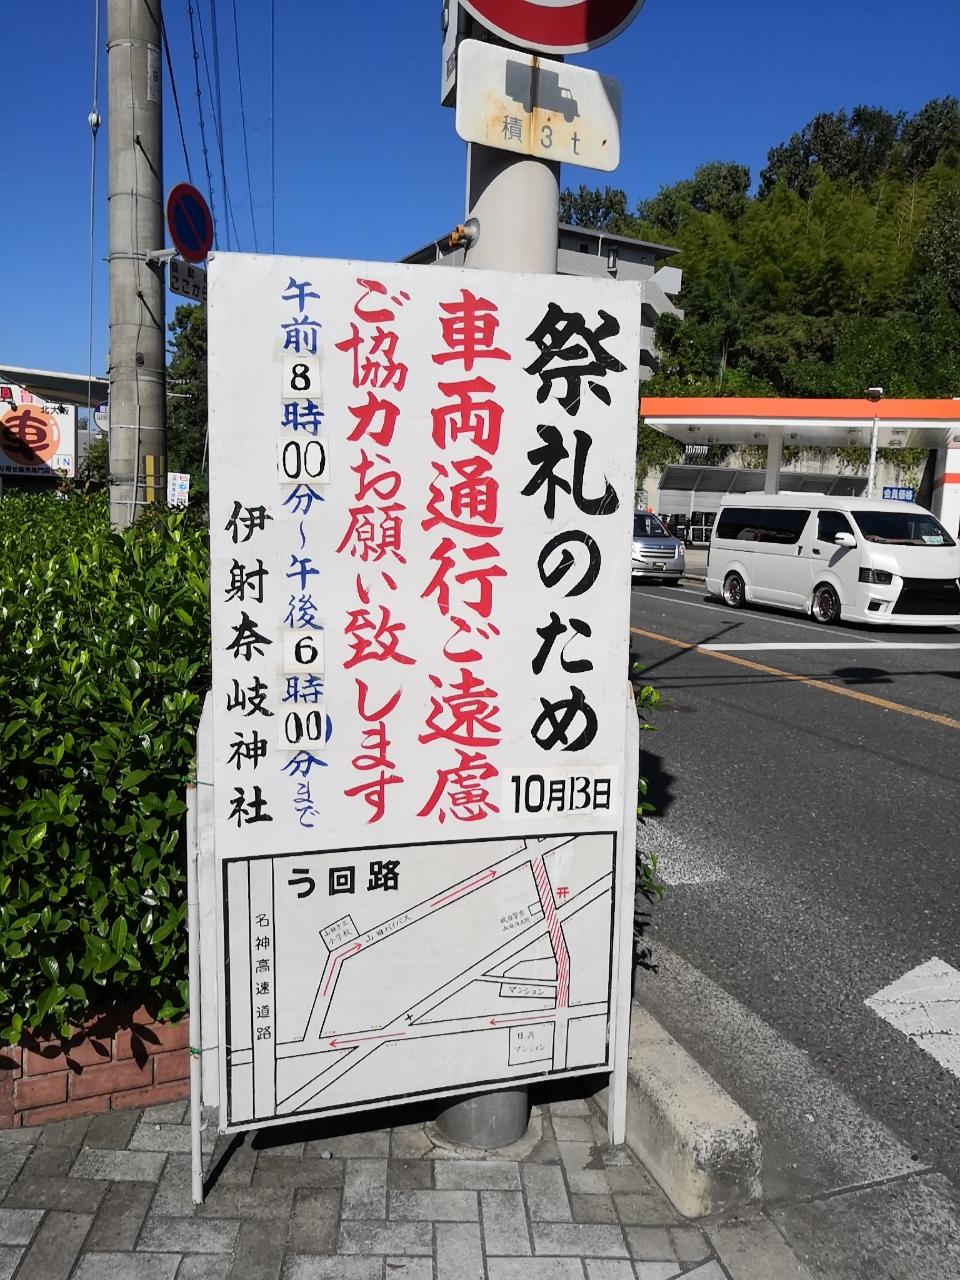 伊射奈岐神社 秋祭り